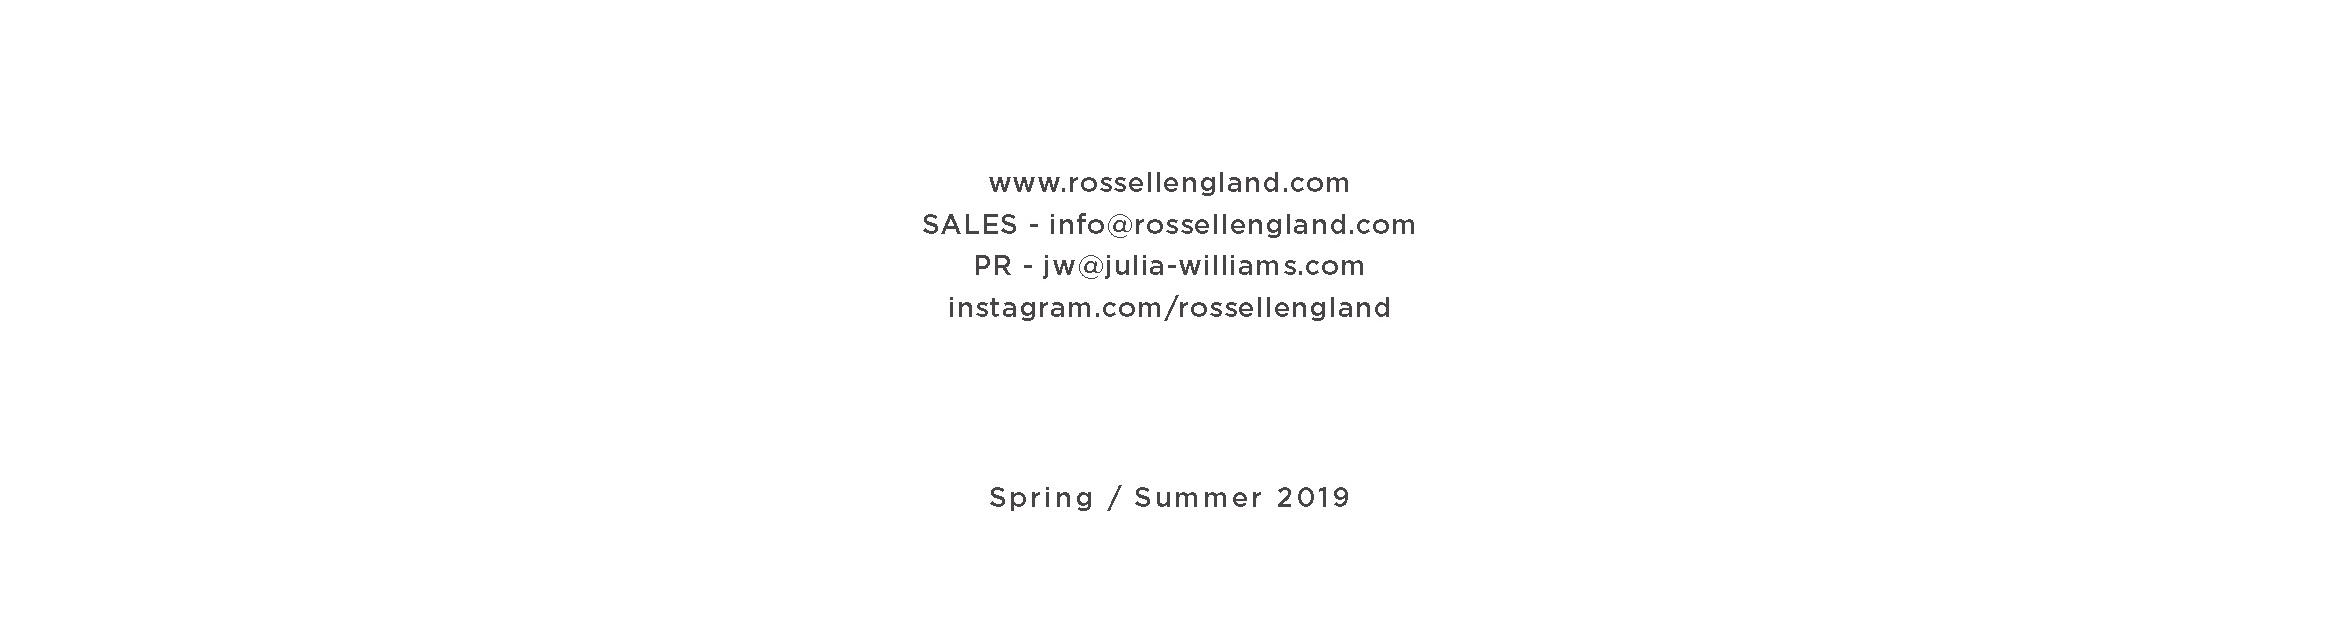 rossell spring summer 19_Page_9.jpg